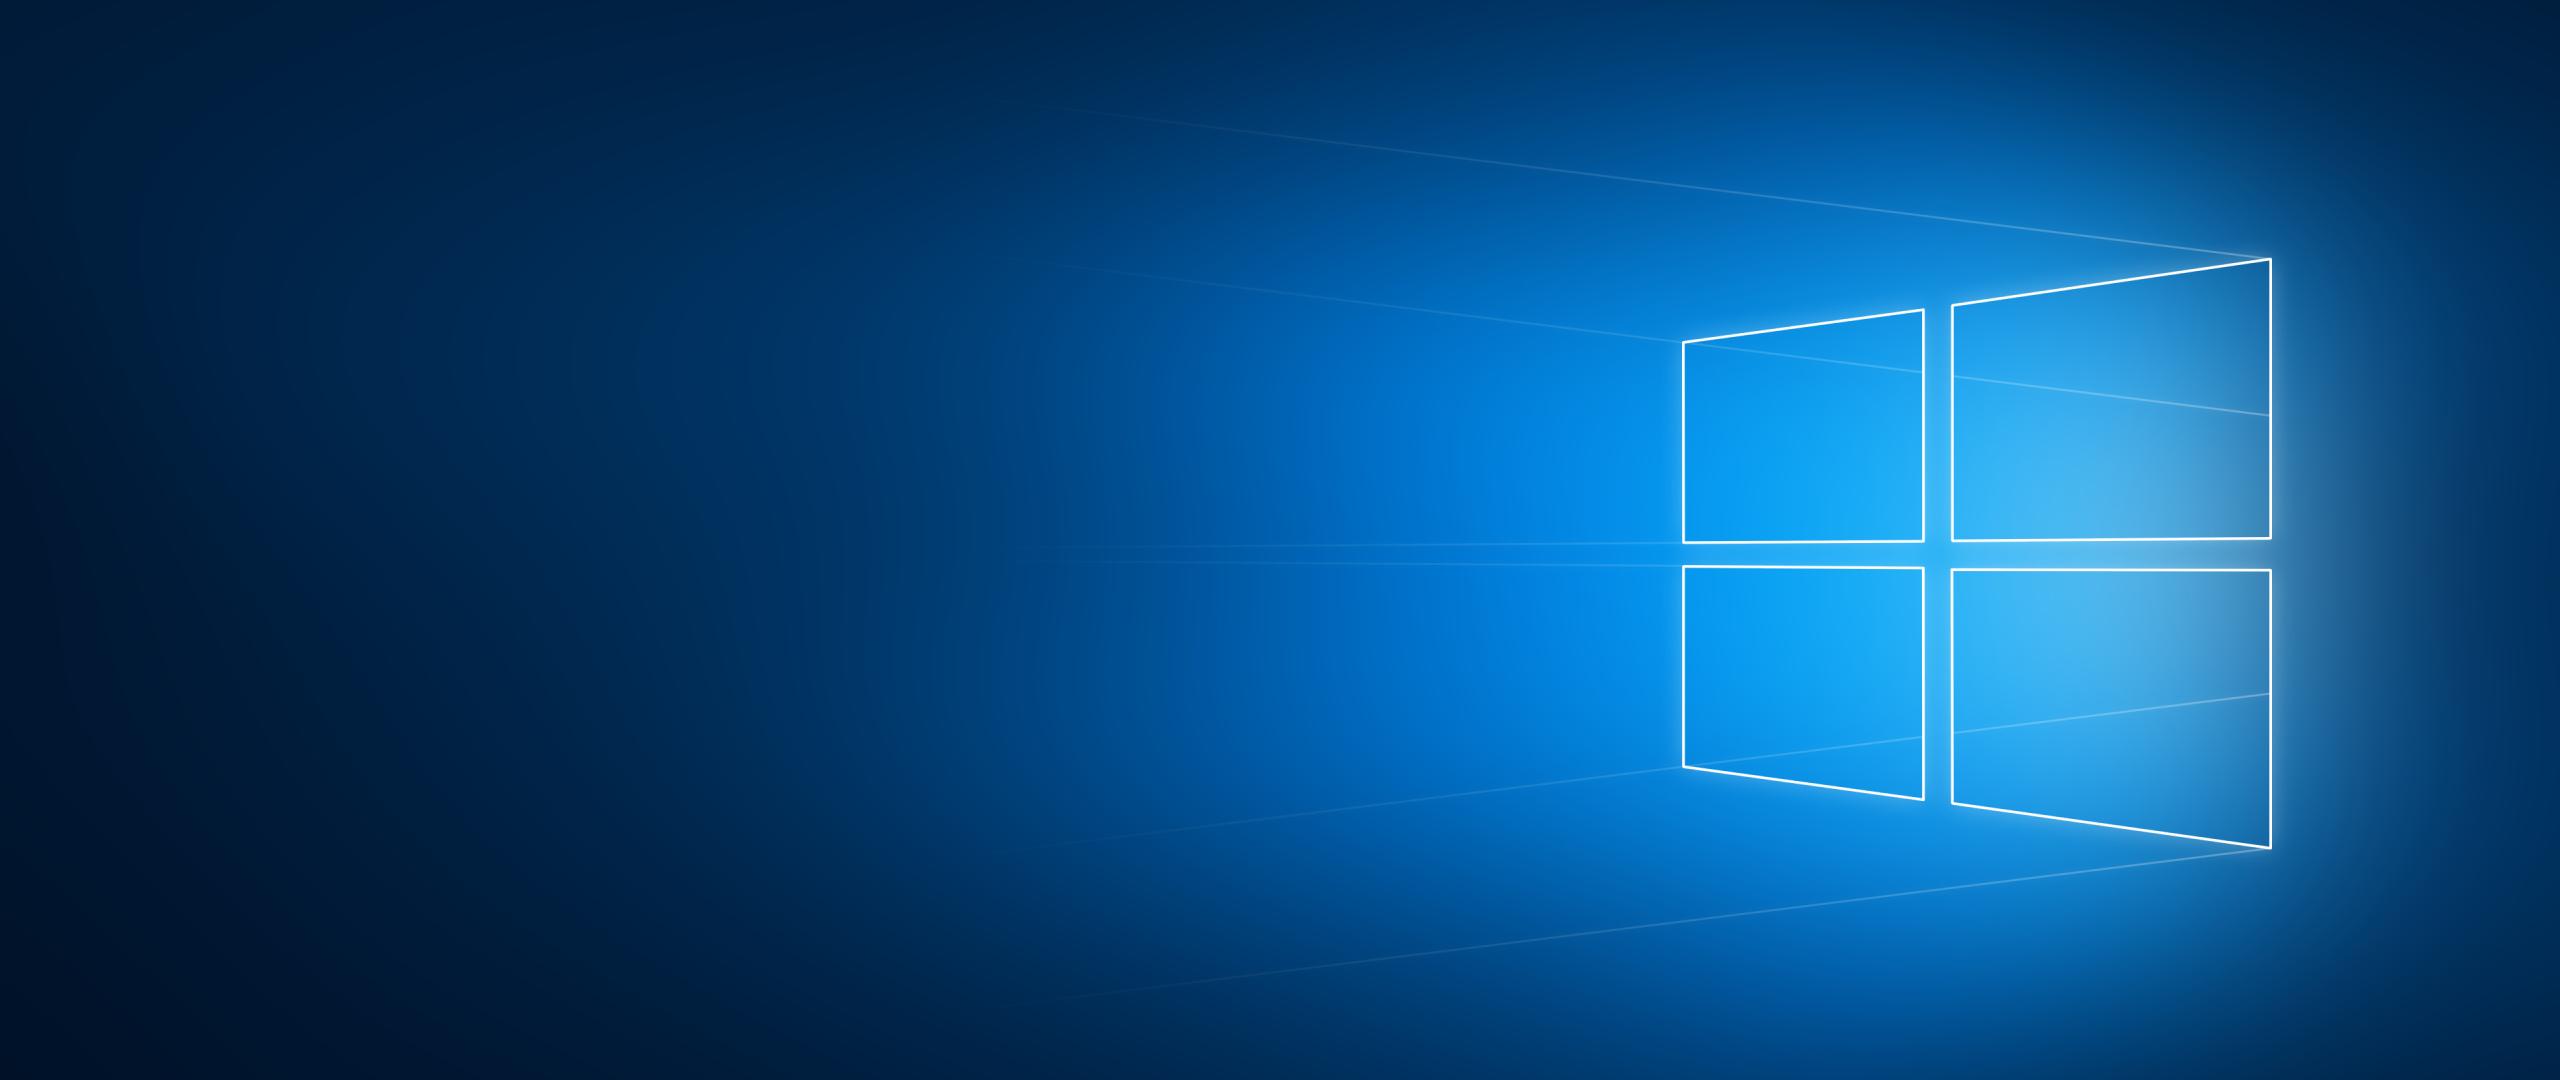 2560x1080 Windows 10 Hero Logo 2560x1080 Resolution ...